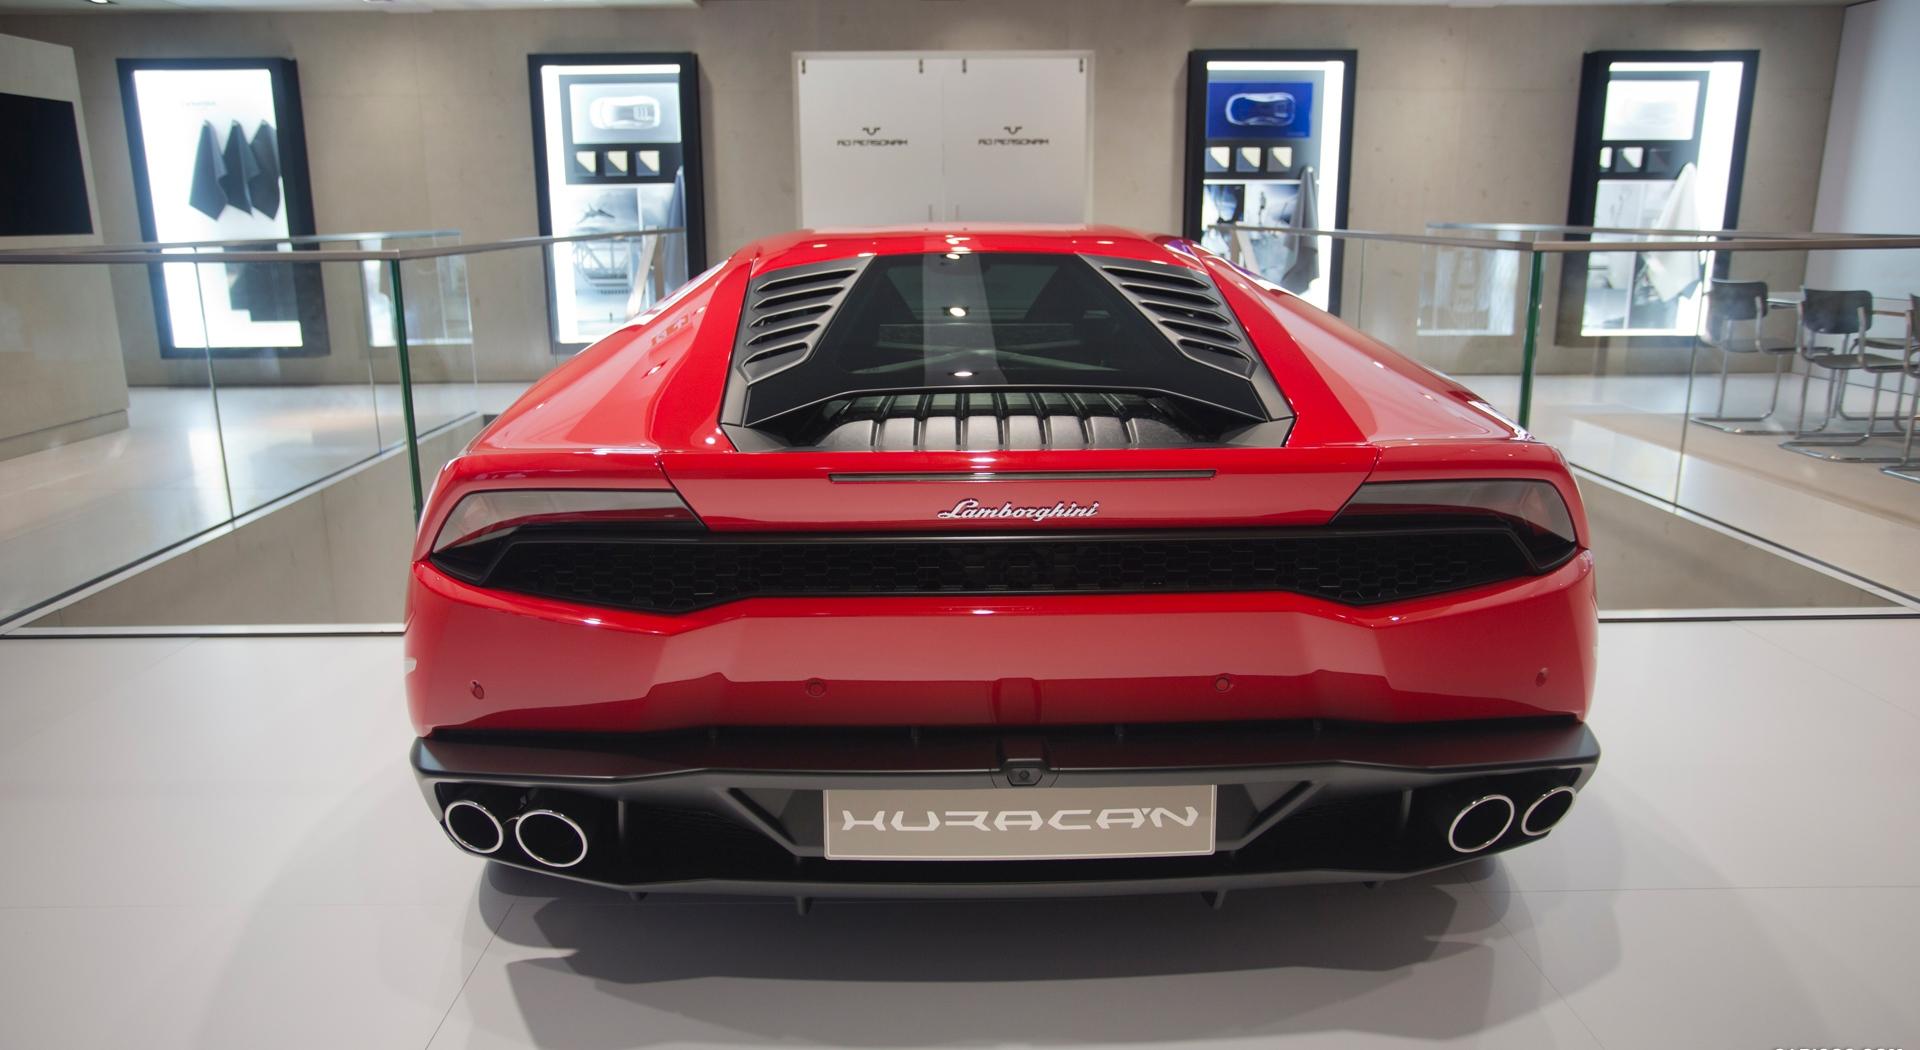 Lamborghini Huracan red image